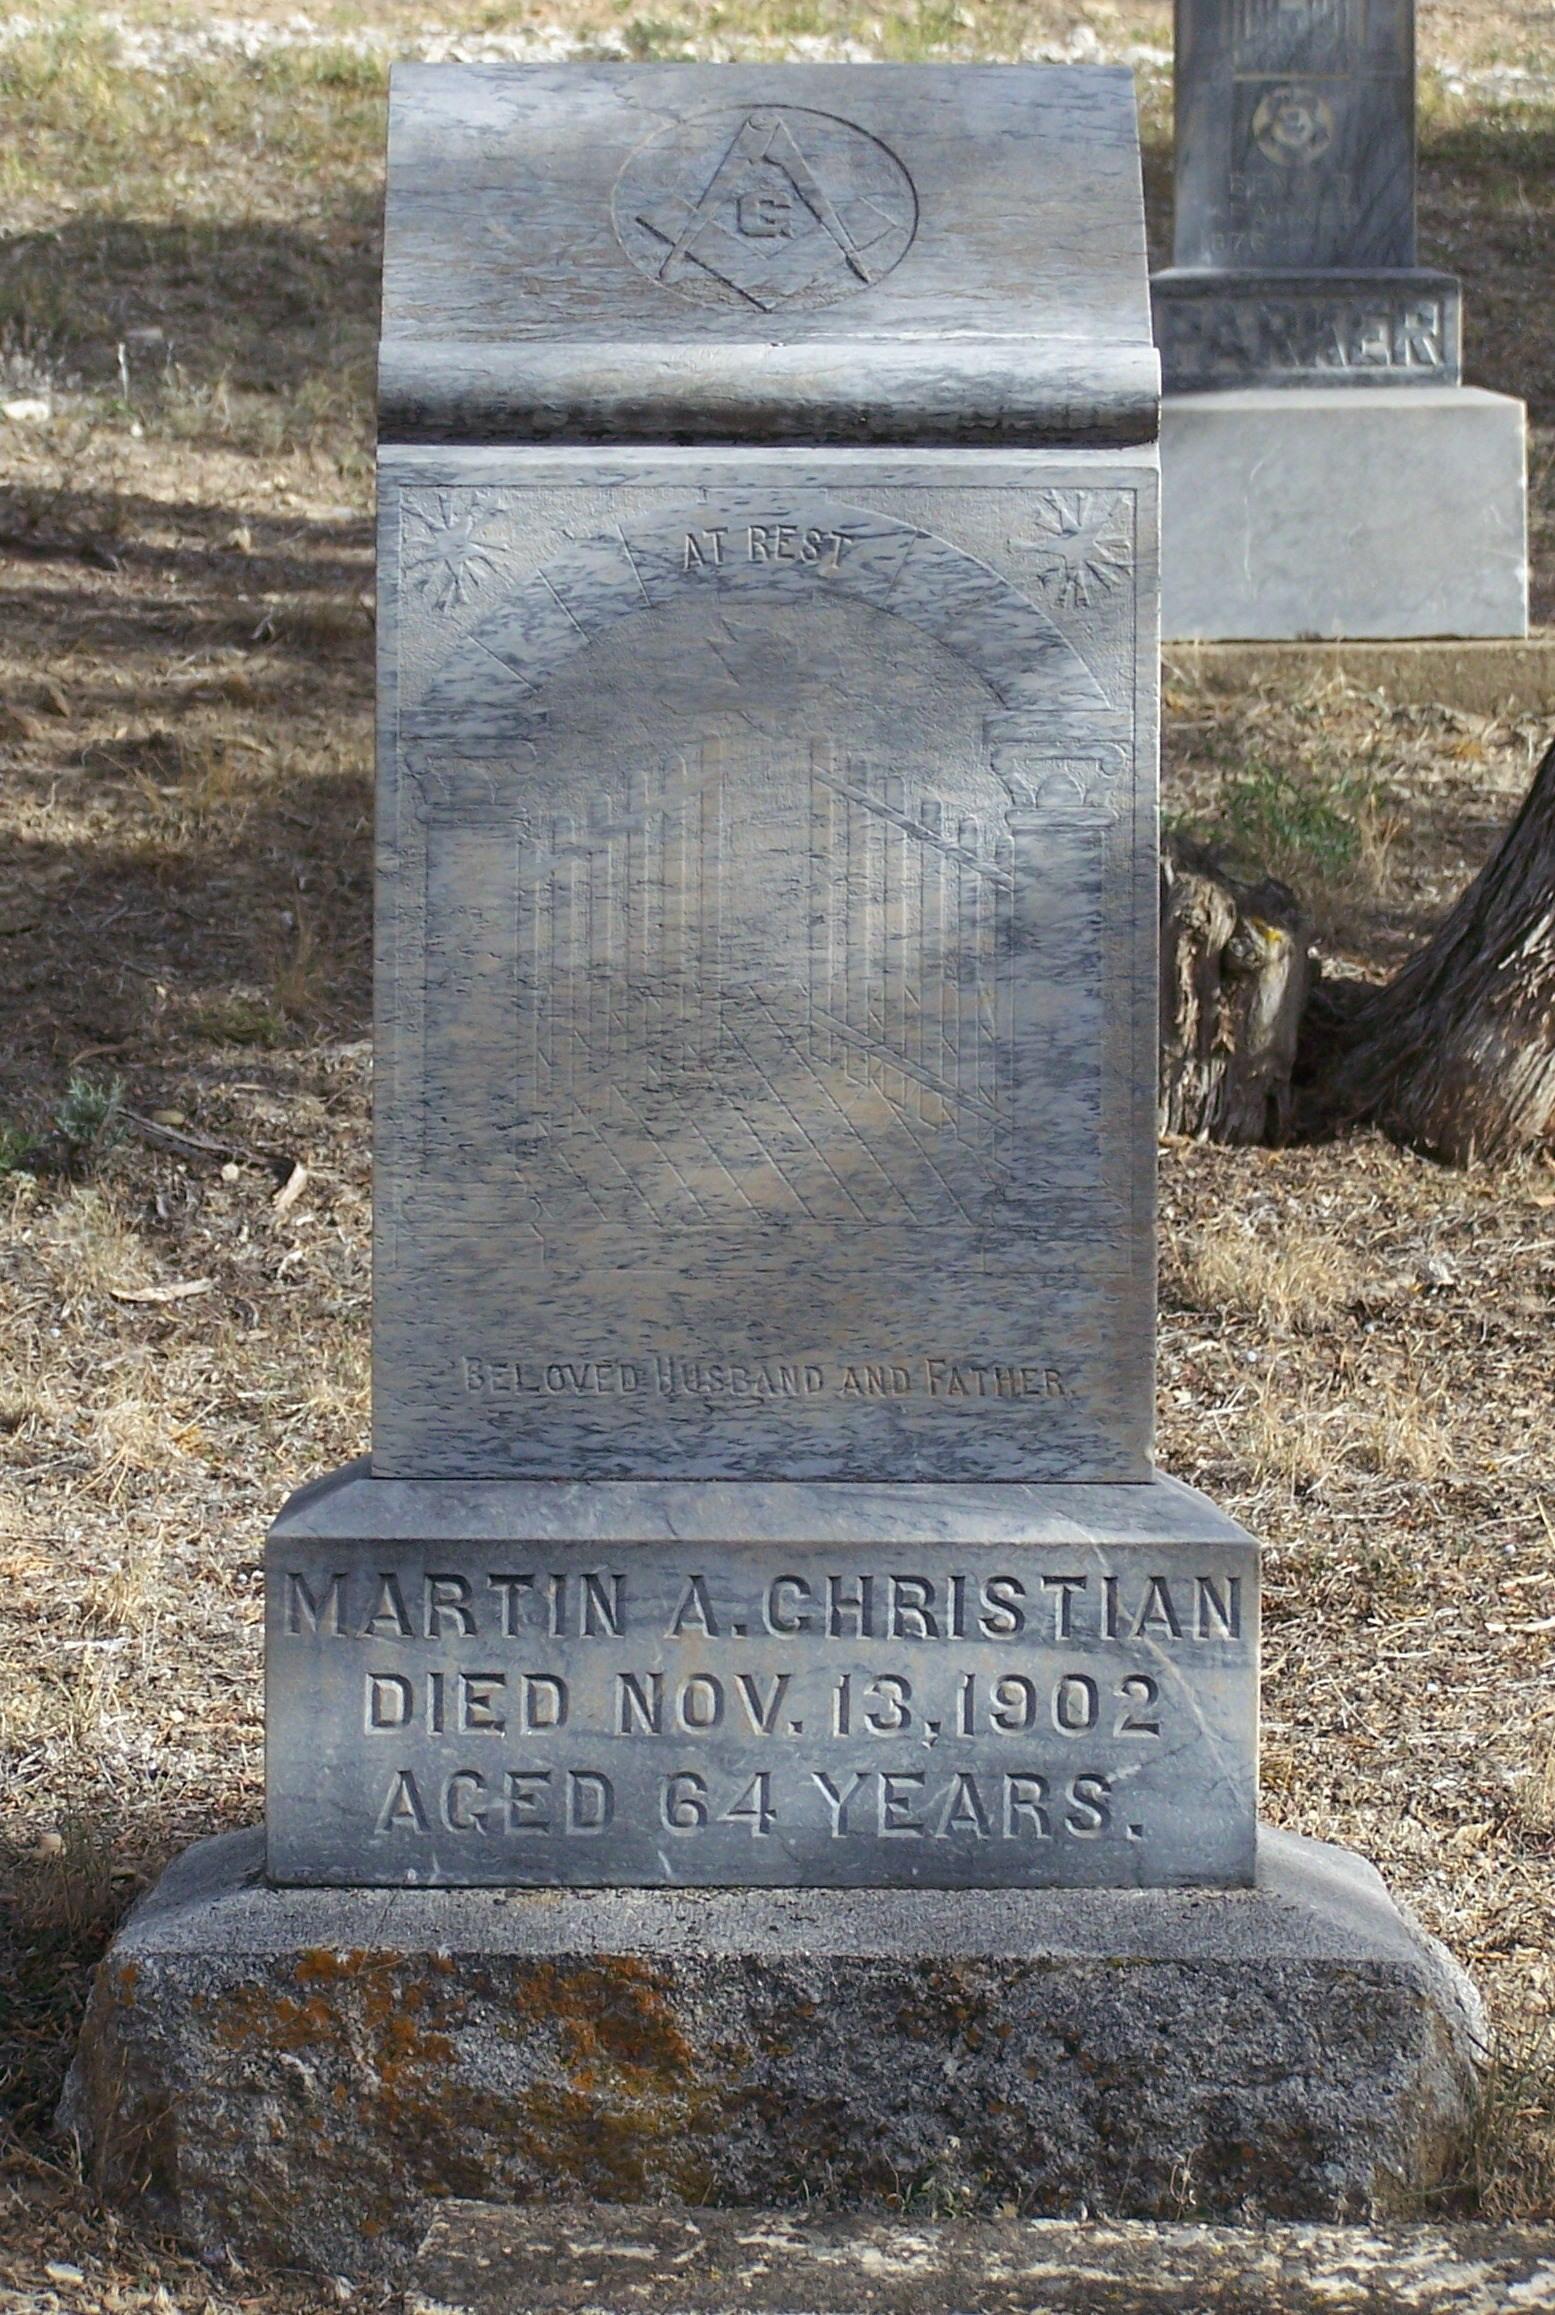 Angeline Christian